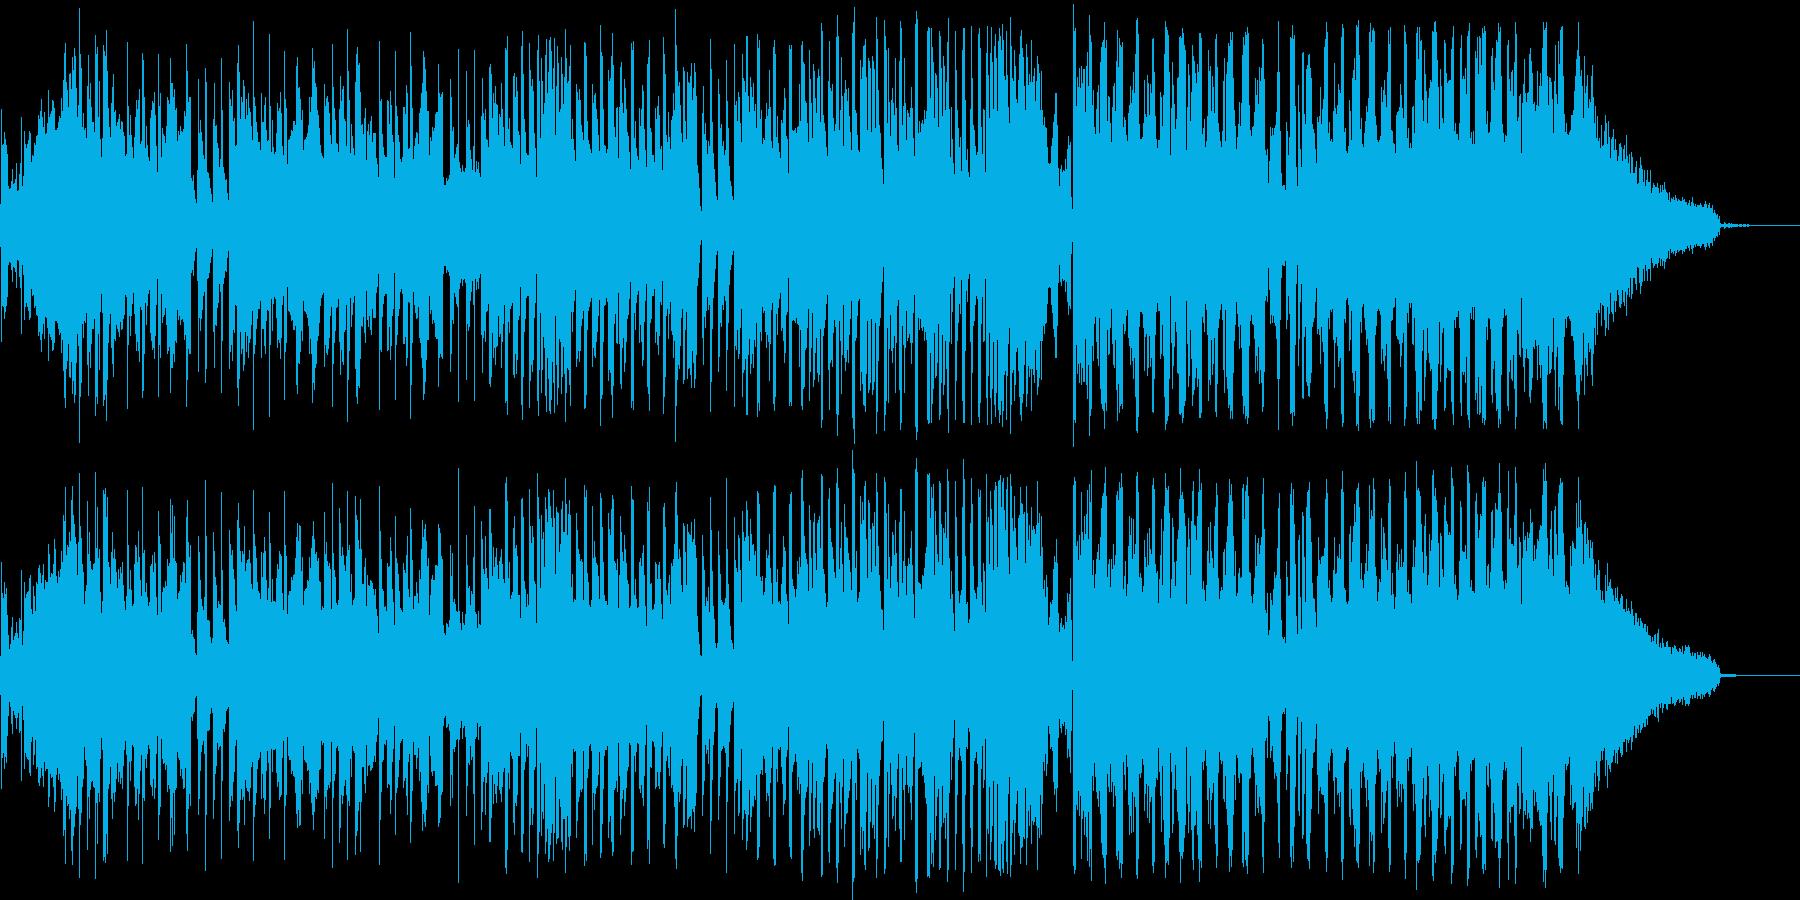 EDM  オープニング ハード バトル系の再生済みの波形